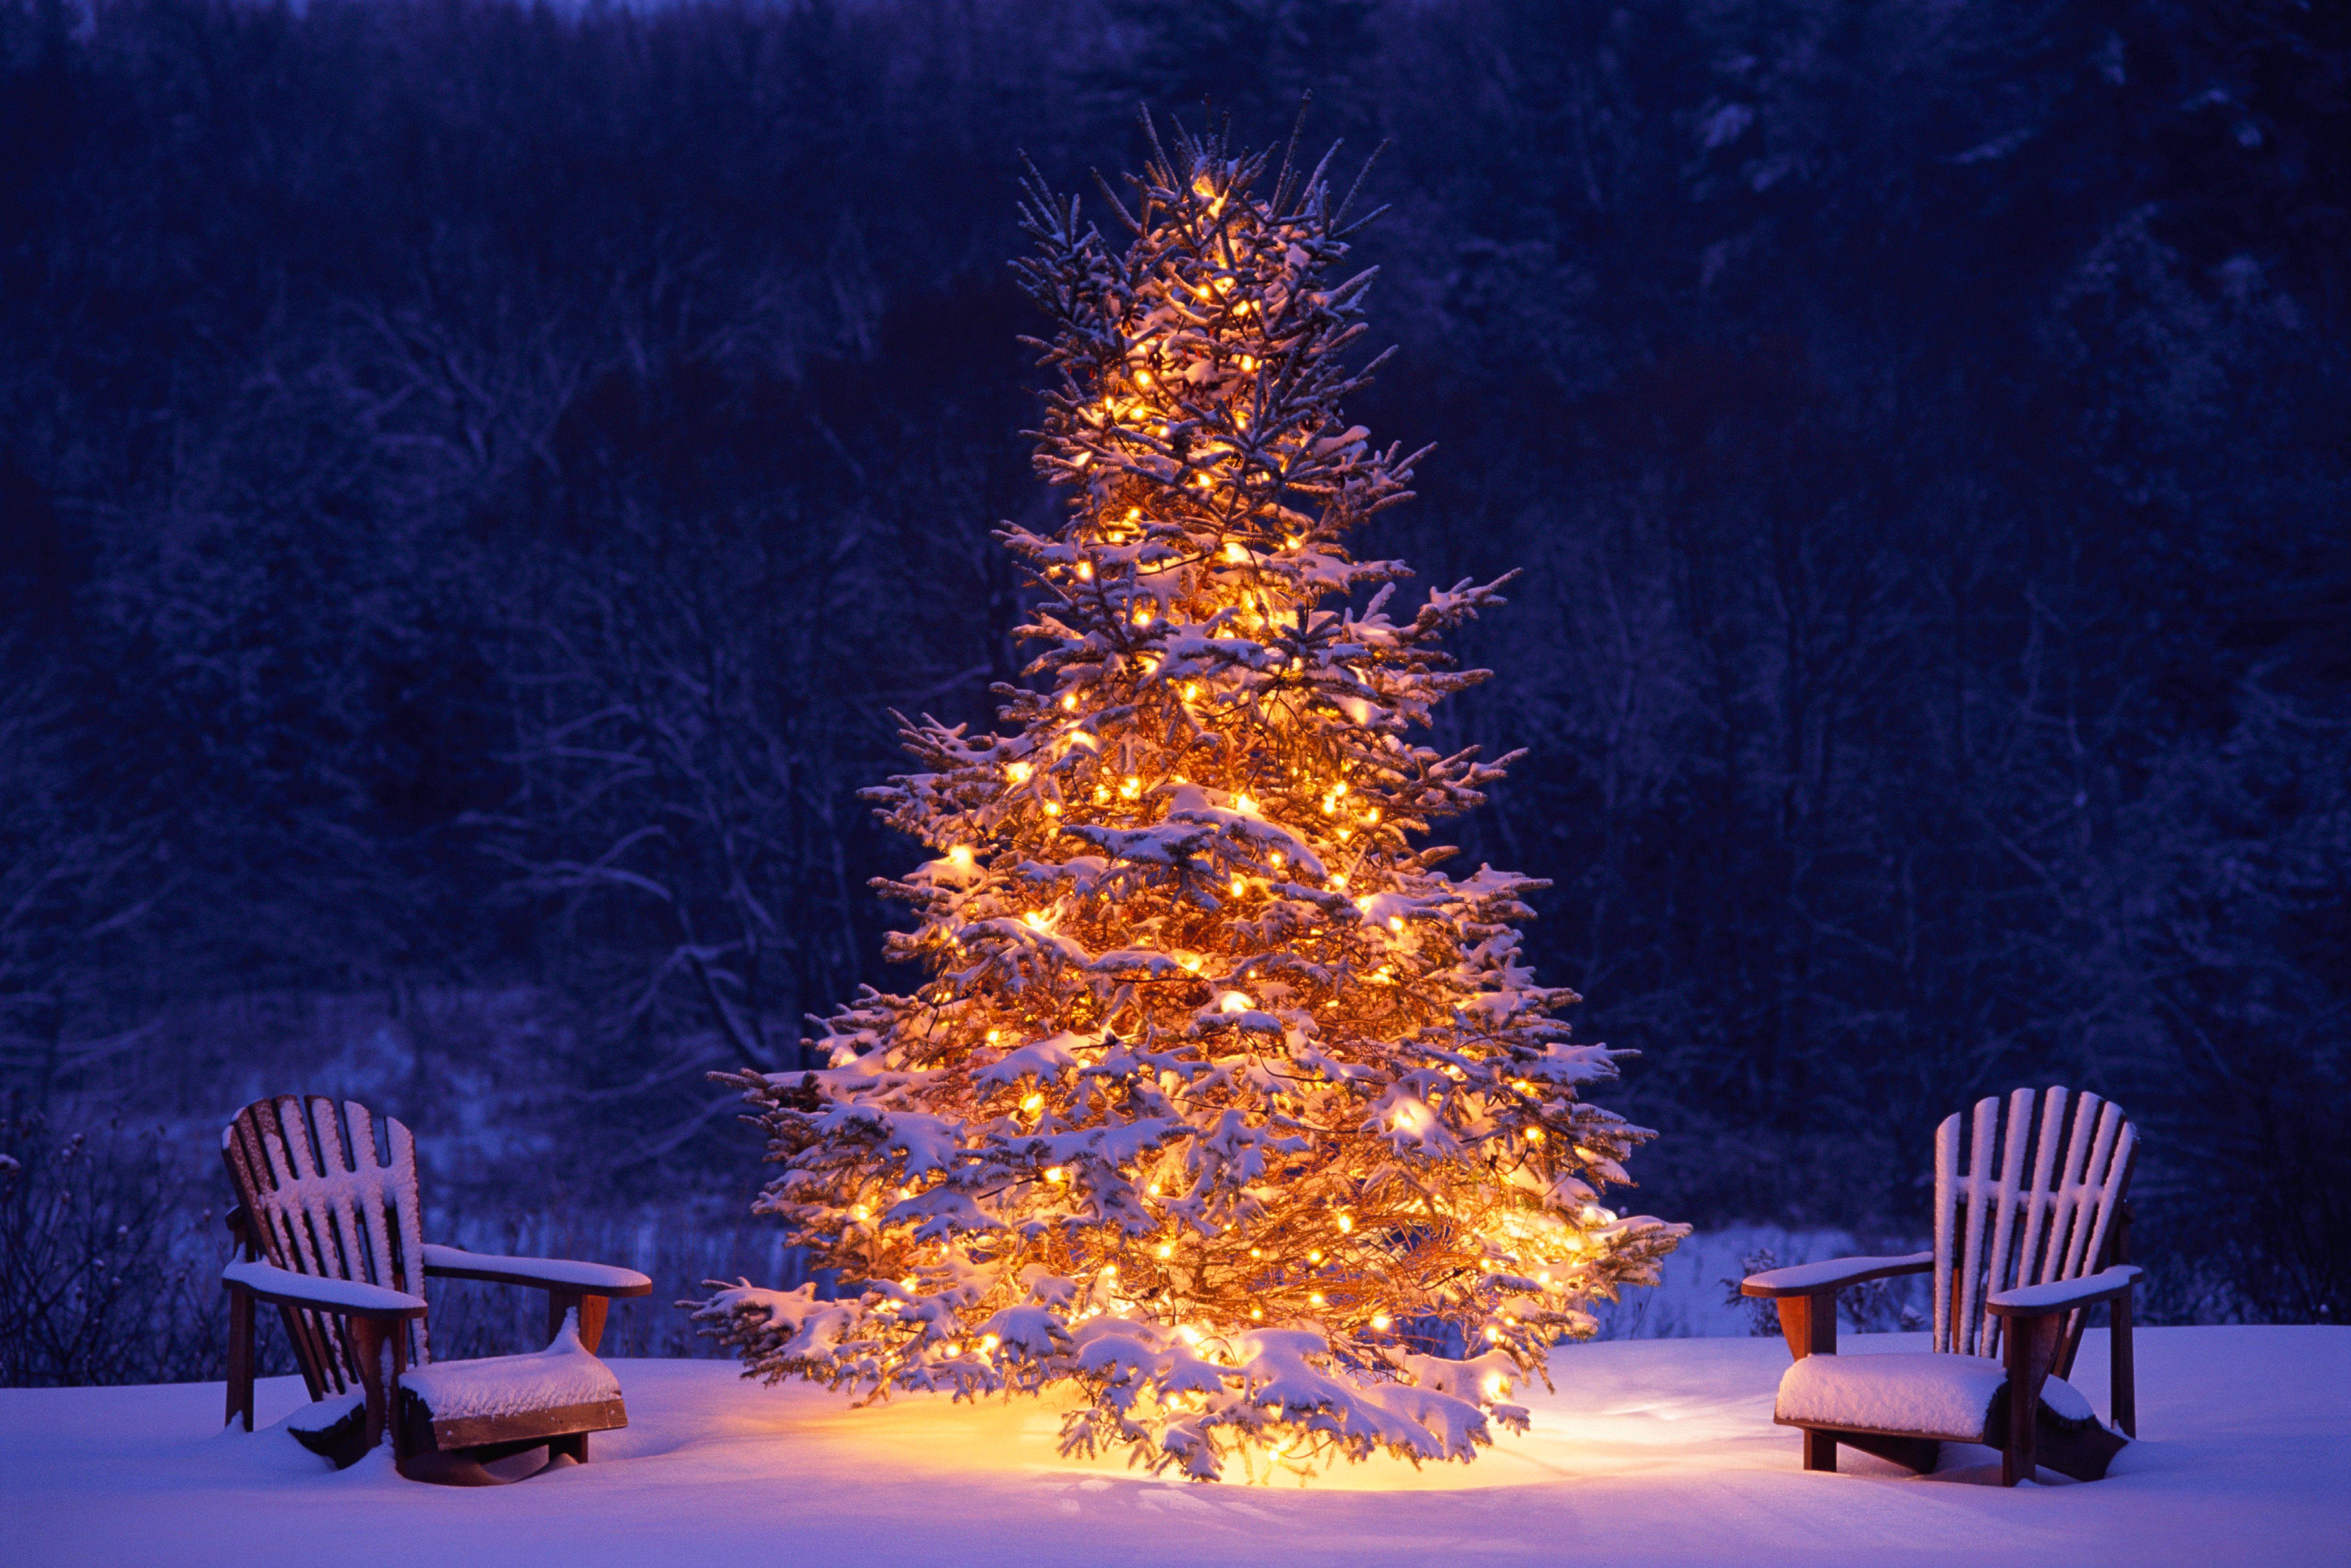 Winter Wonderland Snowy Winter Scenes Christmas Trees Christmas Desktop Christmas Tree Wallpaper Christmas Lights Wallpaper